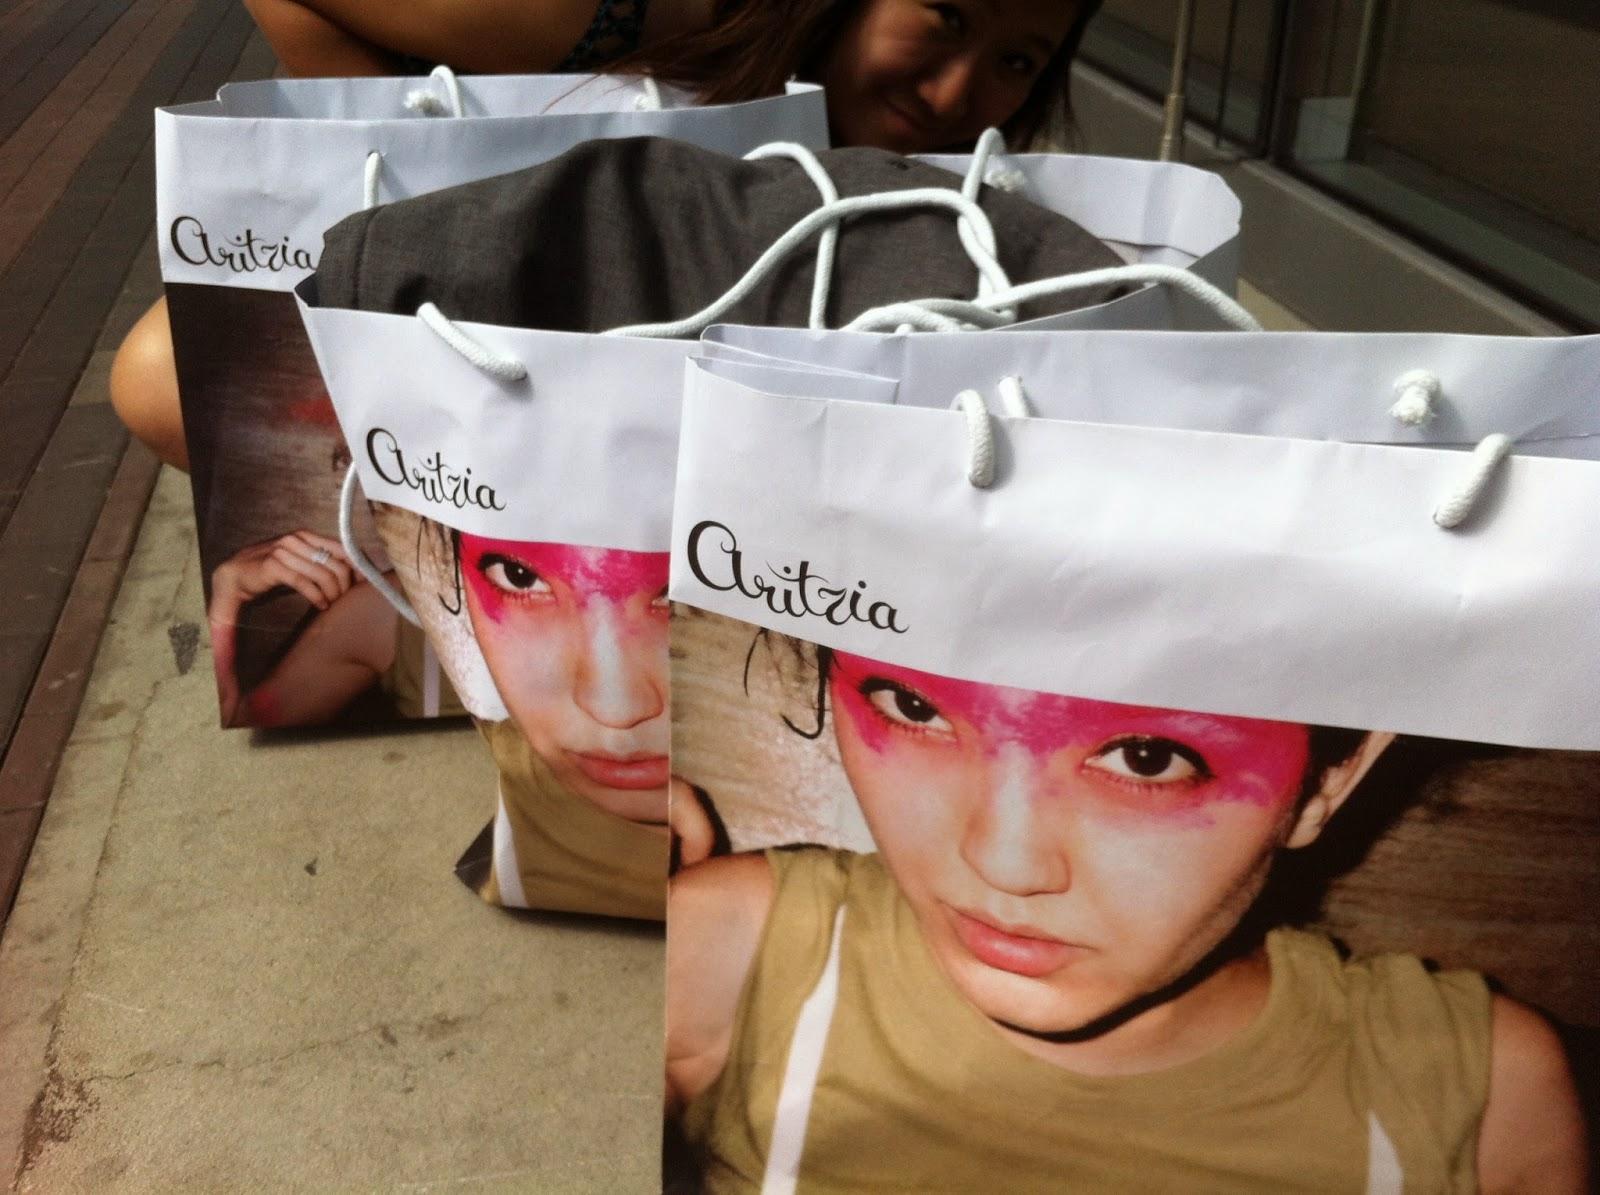 Aritzia Shopping Bag from Aritzia Warehouse Sale